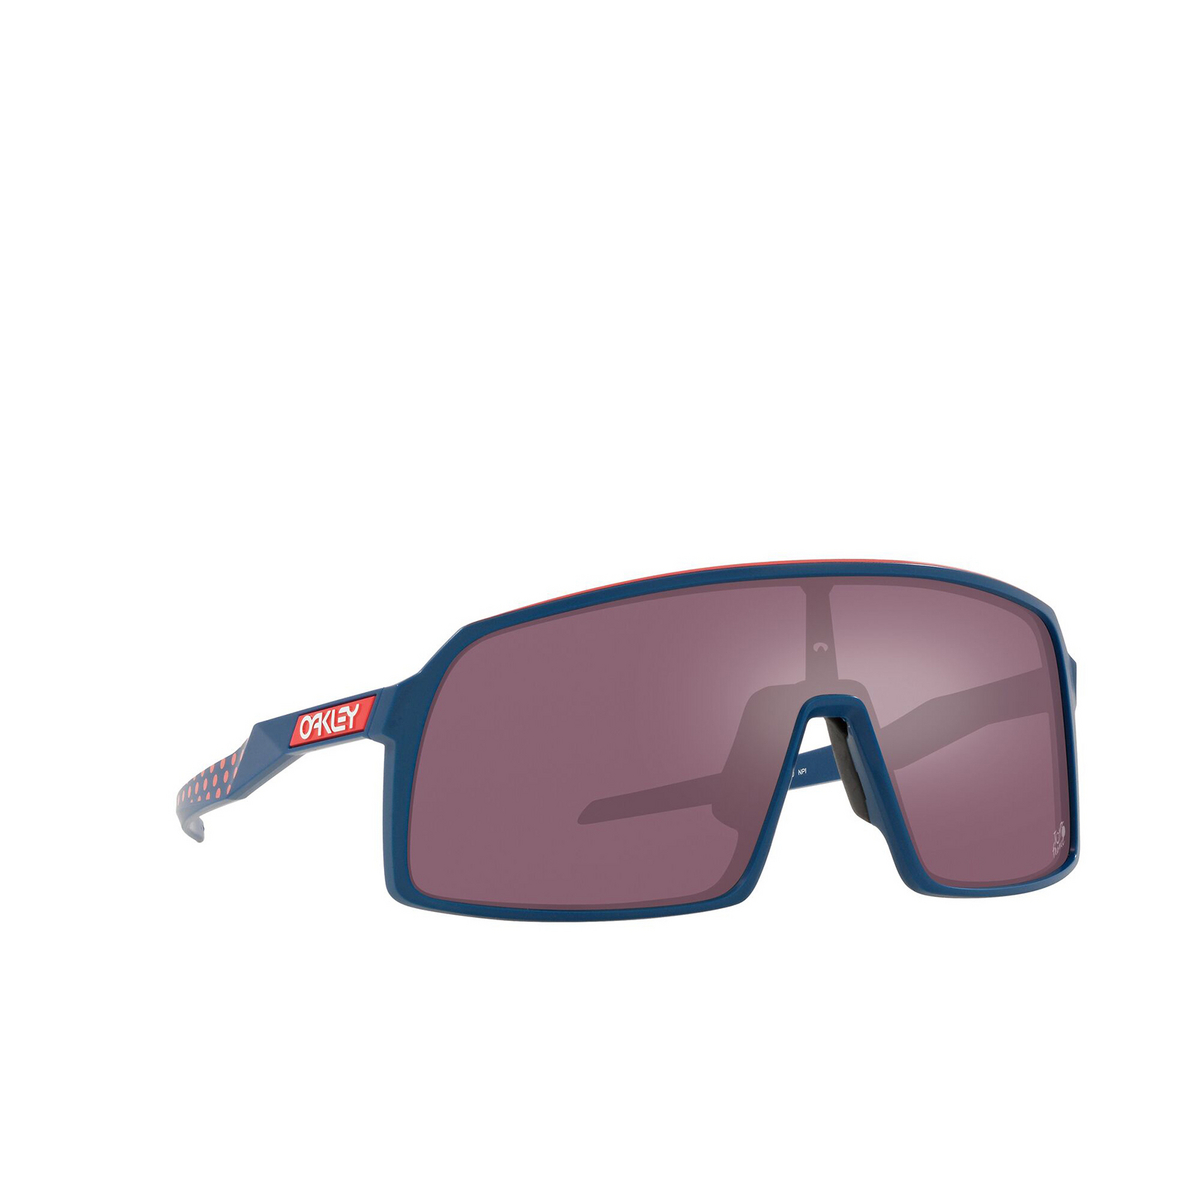 Oakley® Sport Sunglasses: Sutro OO9406 color Tdf Poseidon 940658 - three-quarters view.